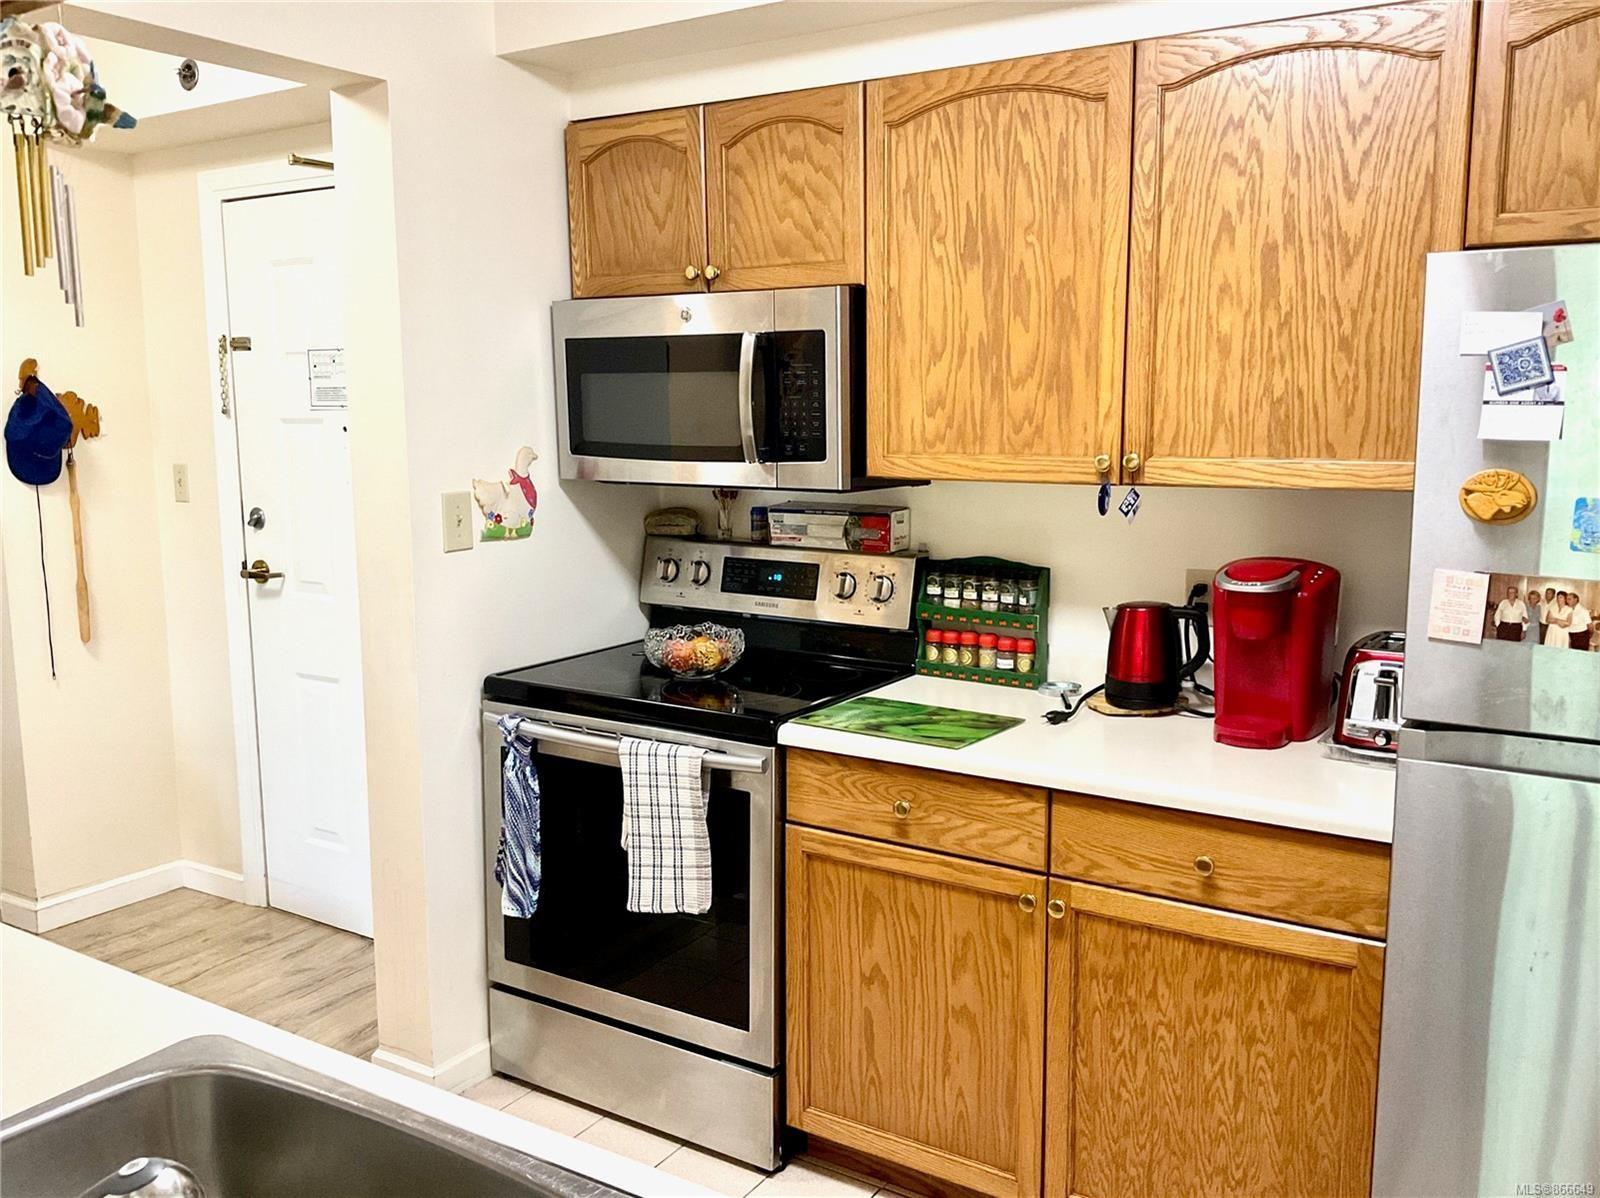 Photo 10: Photos: 308 3969 Shelbourne St in : SE Lambrick Park Condo for sale (Saanich East)  : MLS®# 866649